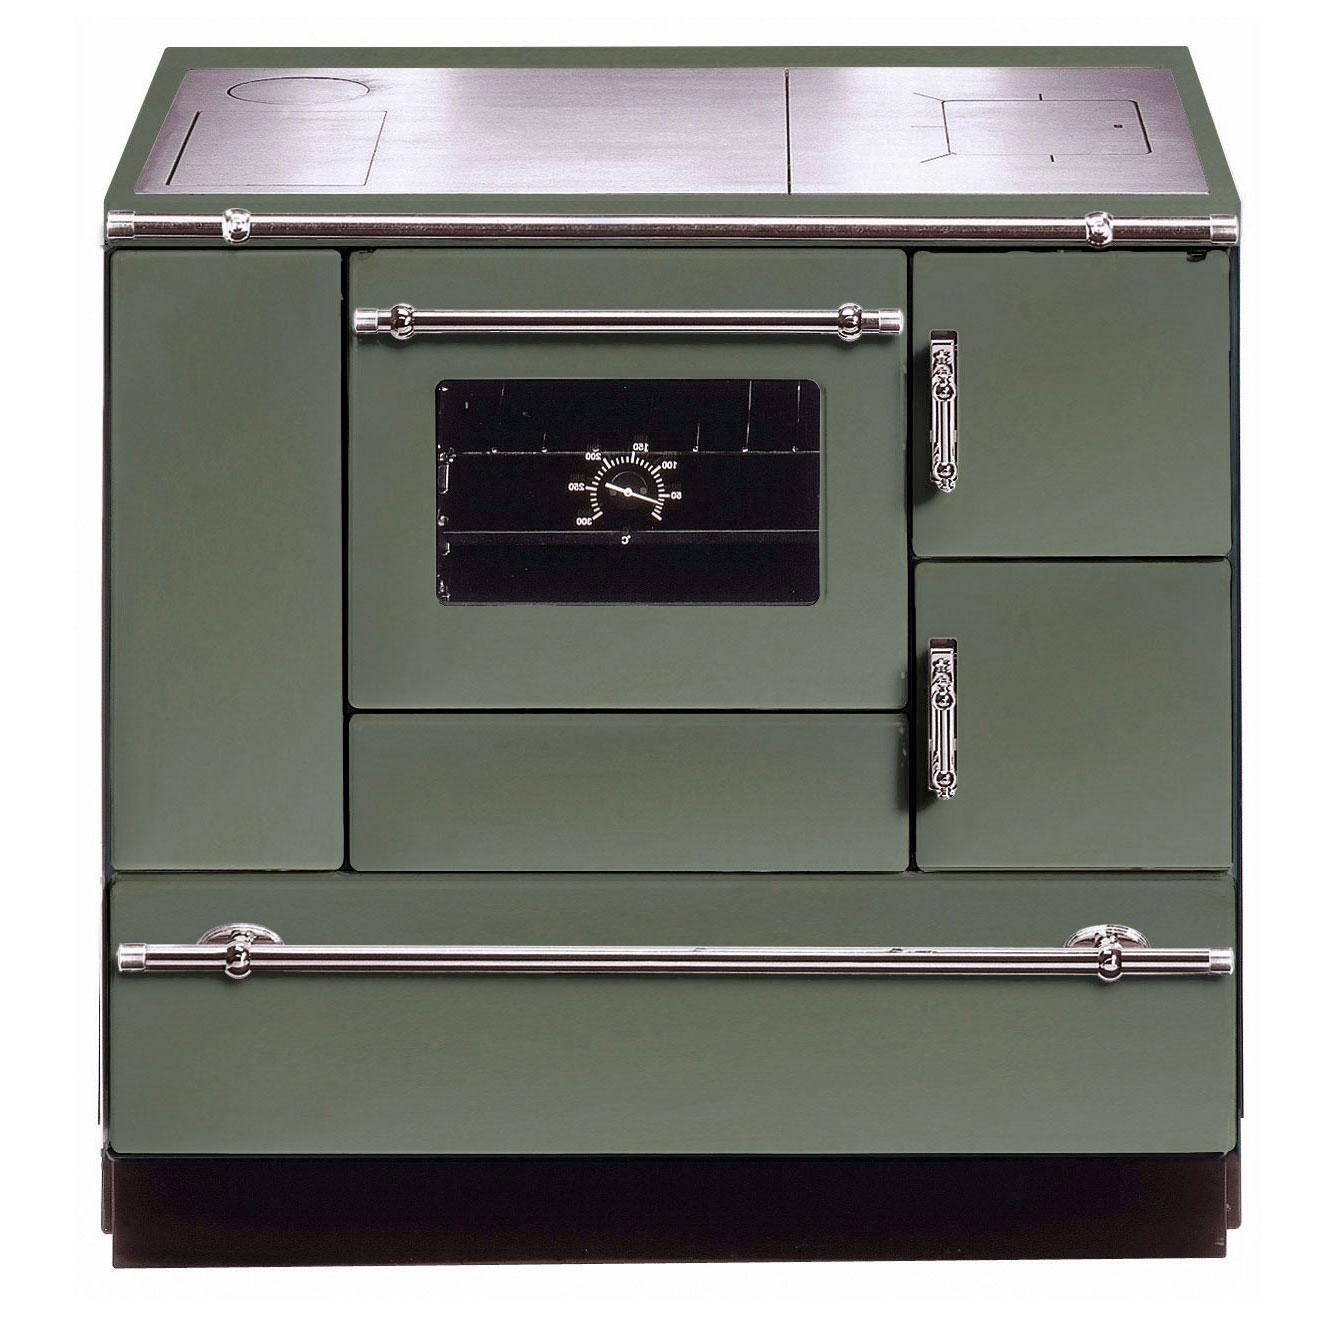 Küchenherd Wamsler K138CL Creative-Line anthrazit metallic Ans links Bild 1